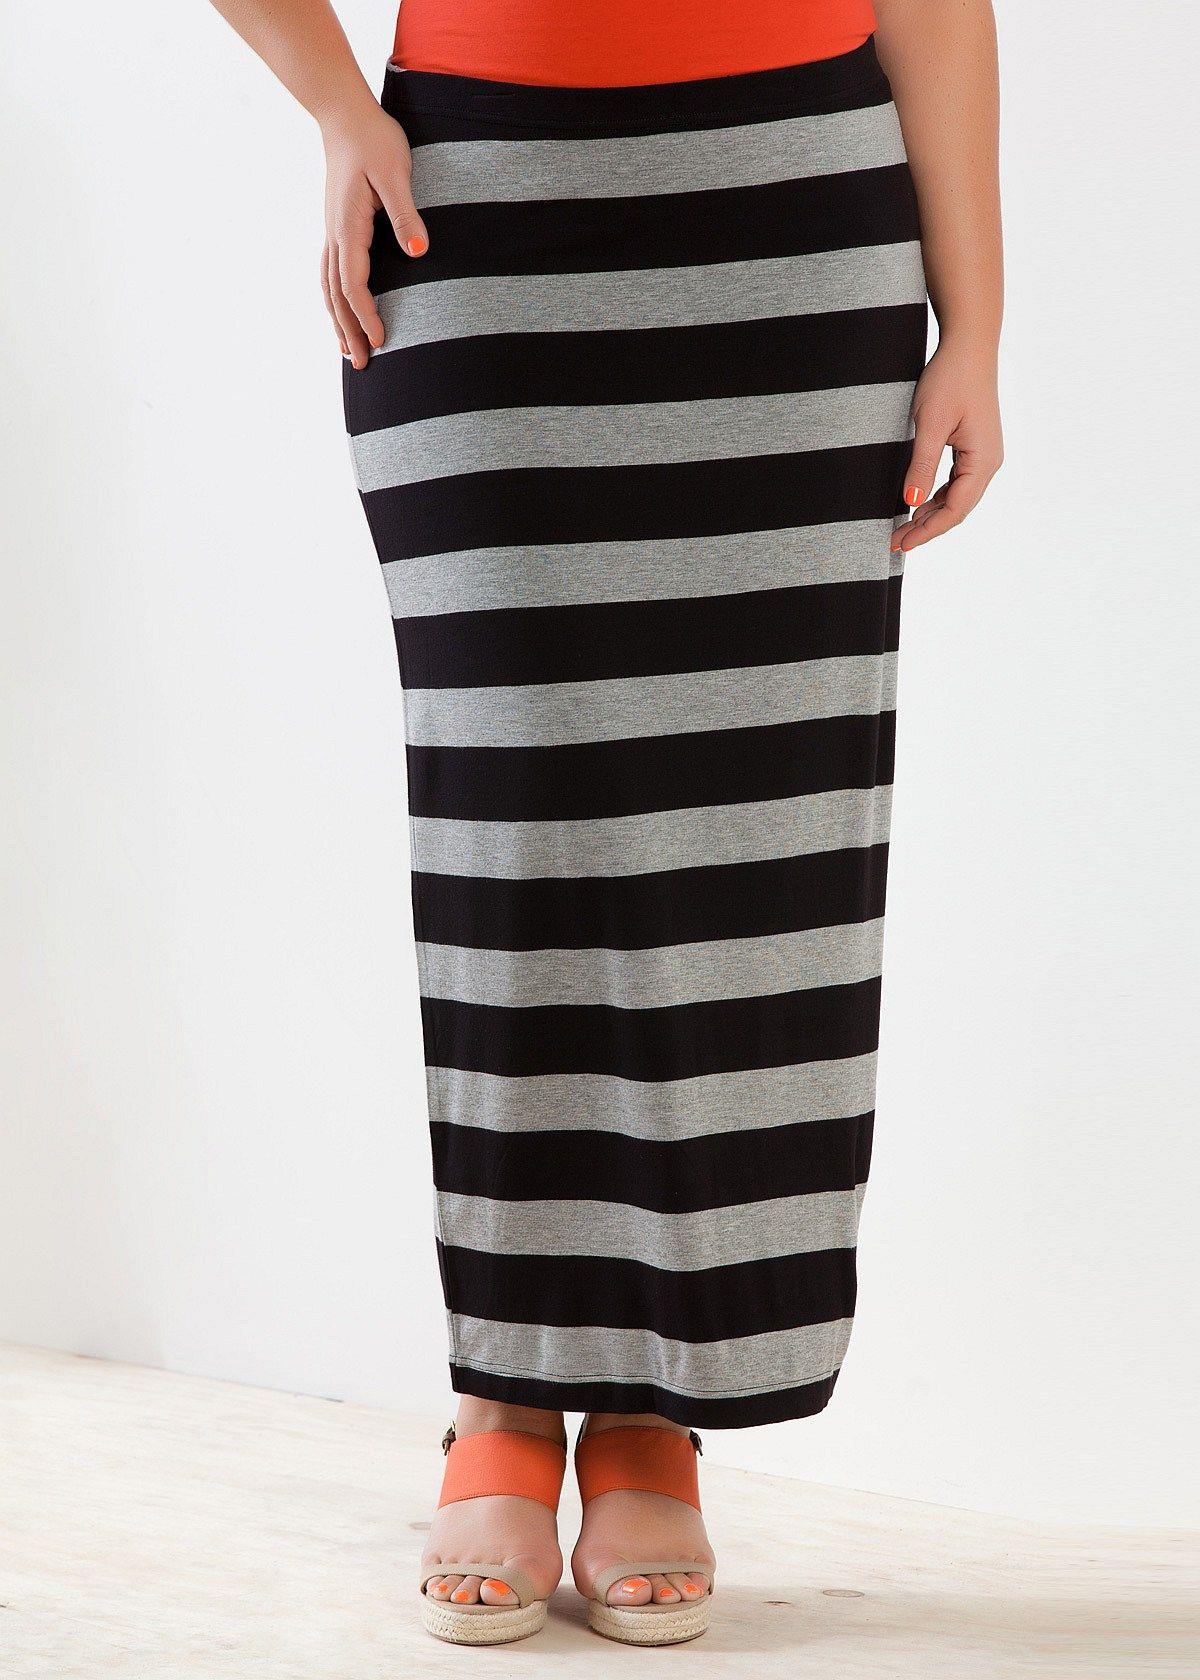 Fashion week Denim Long skirts australia pictures for girls